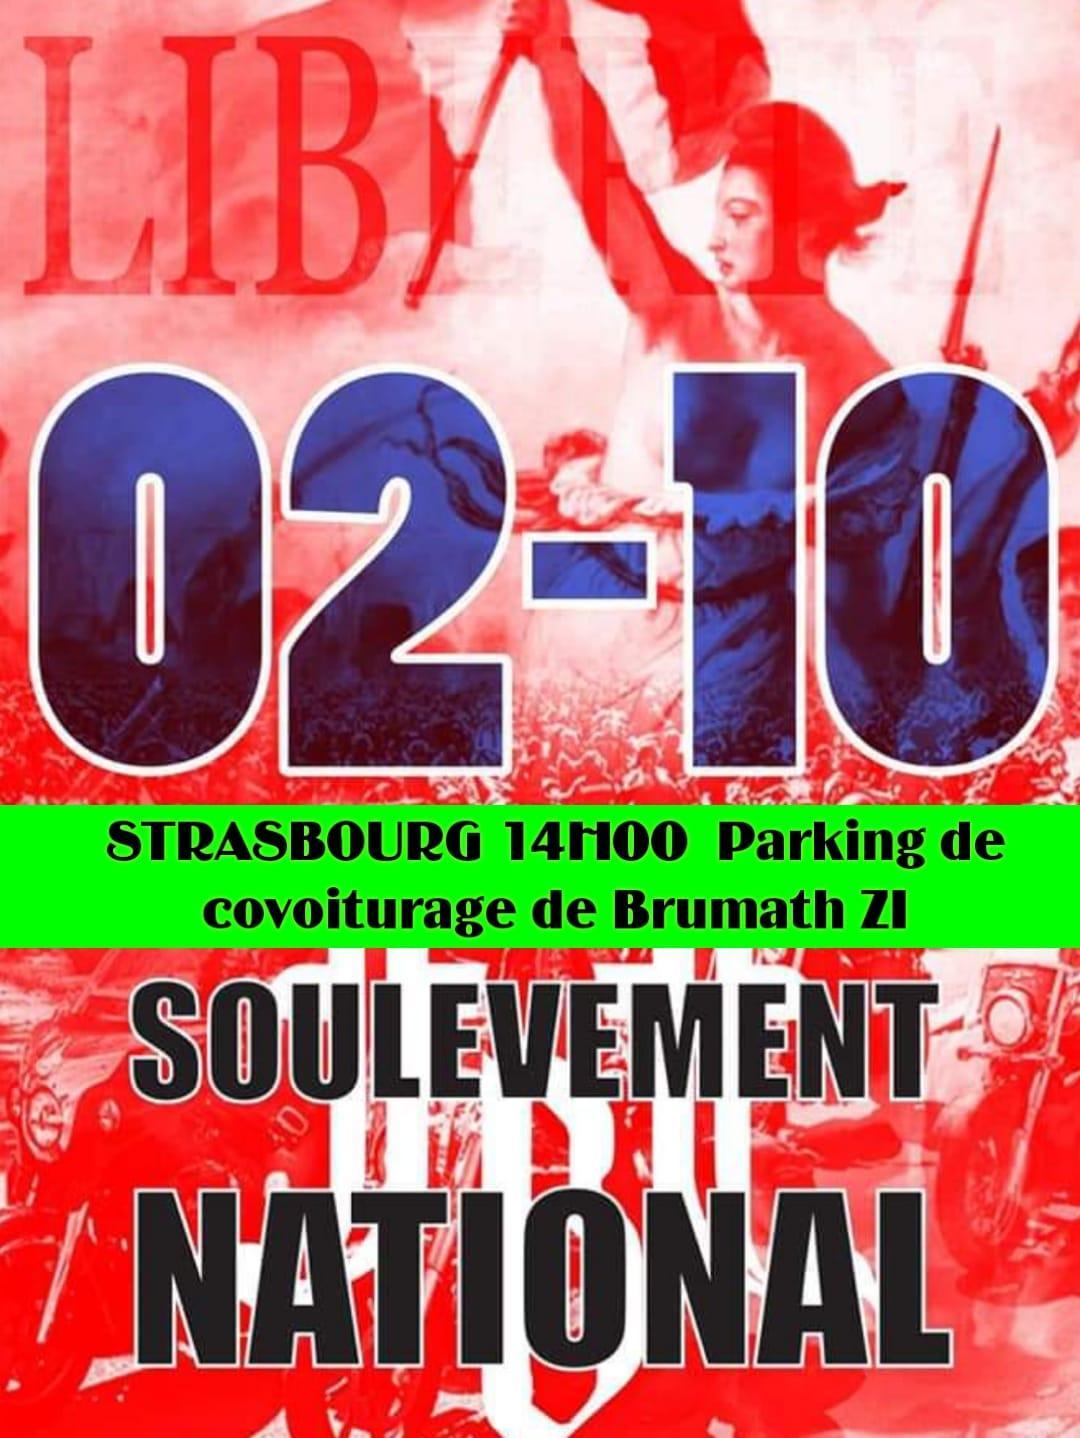 Soulevement national strasbourg